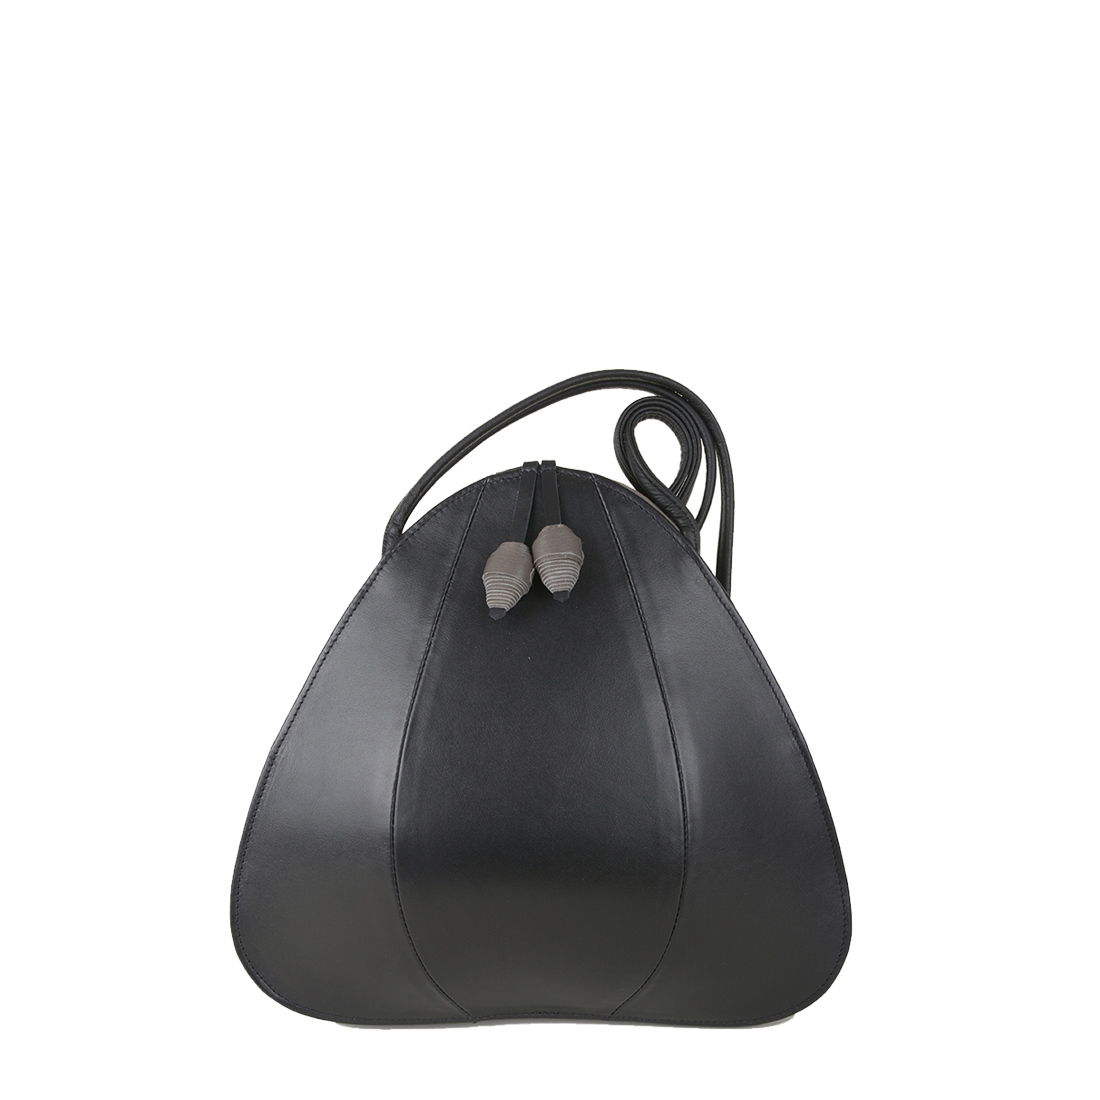 Petal Black Grigio Leather Shoulder Bag